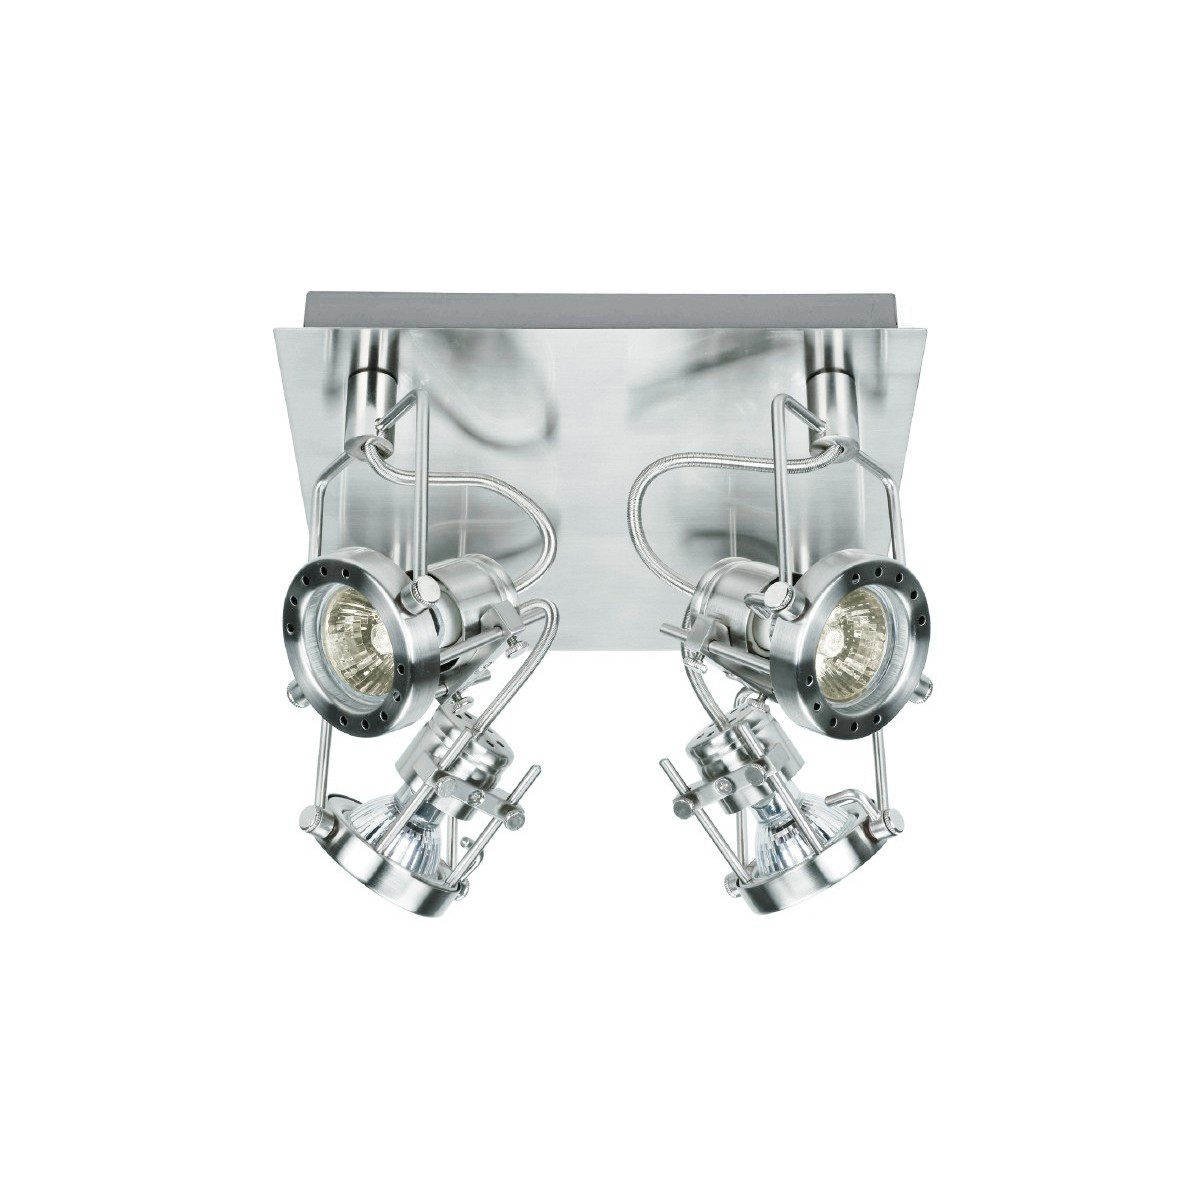 SPOT-TECHNO-PL4 - Plafonnier carré chromé 42 watts 2800 kelvin GU10